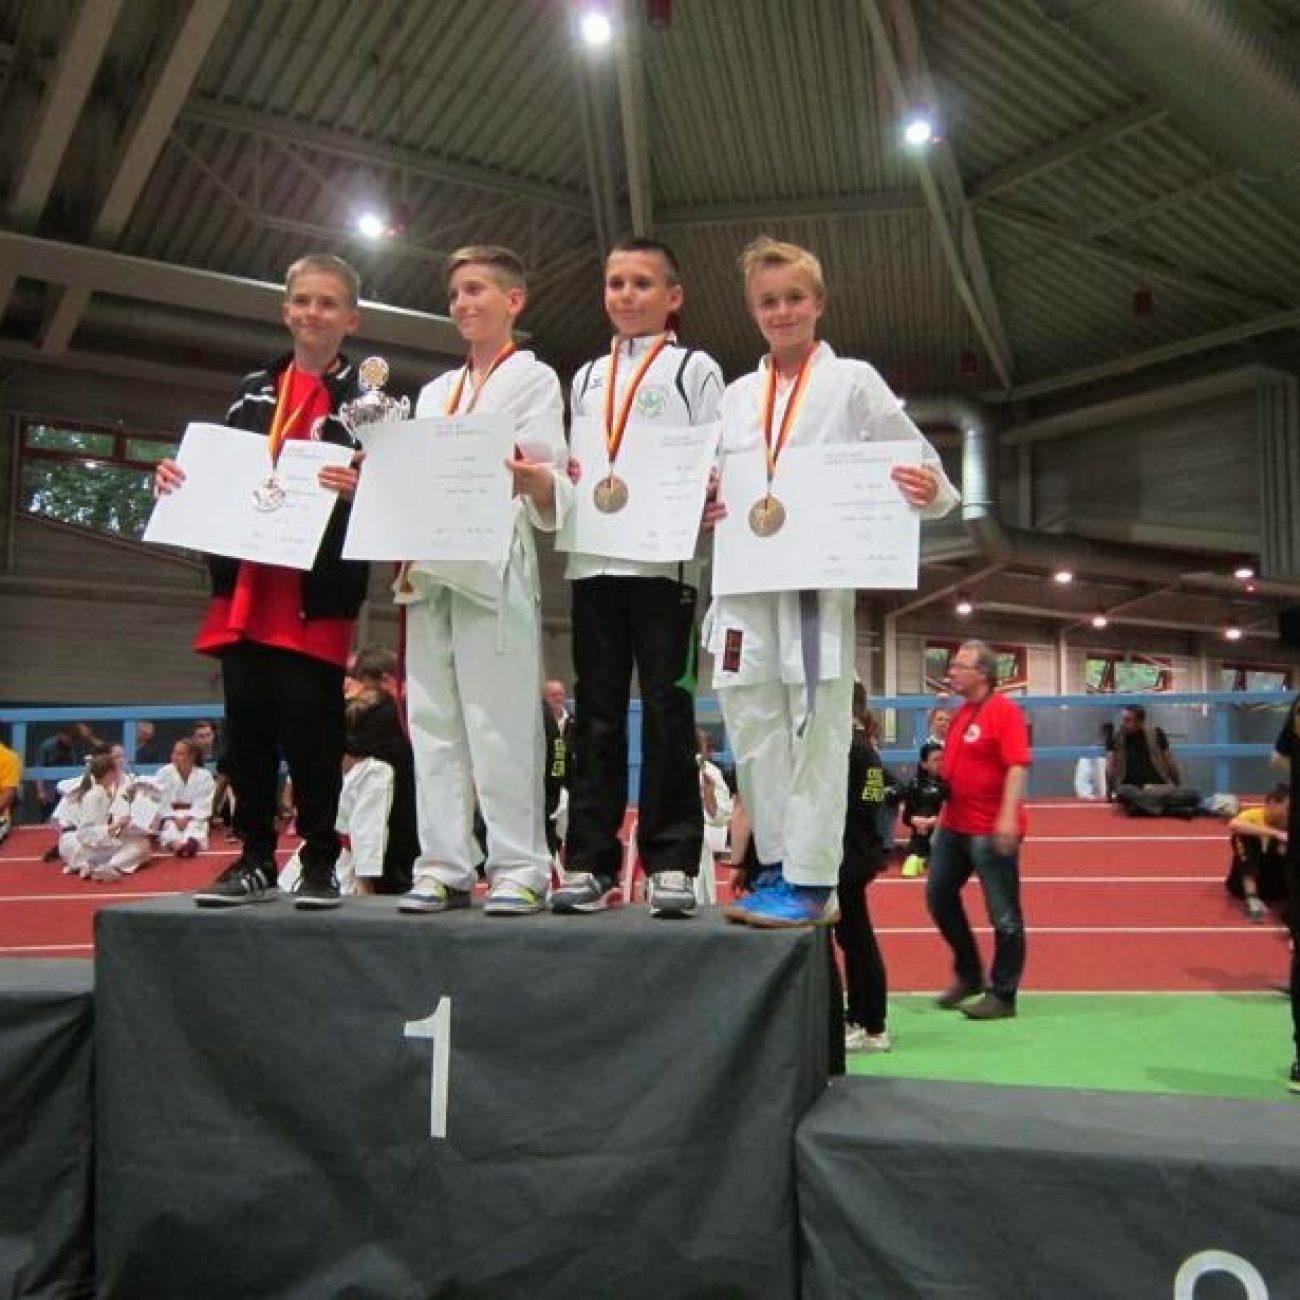 Deutsche Meisterschaft der Schüler